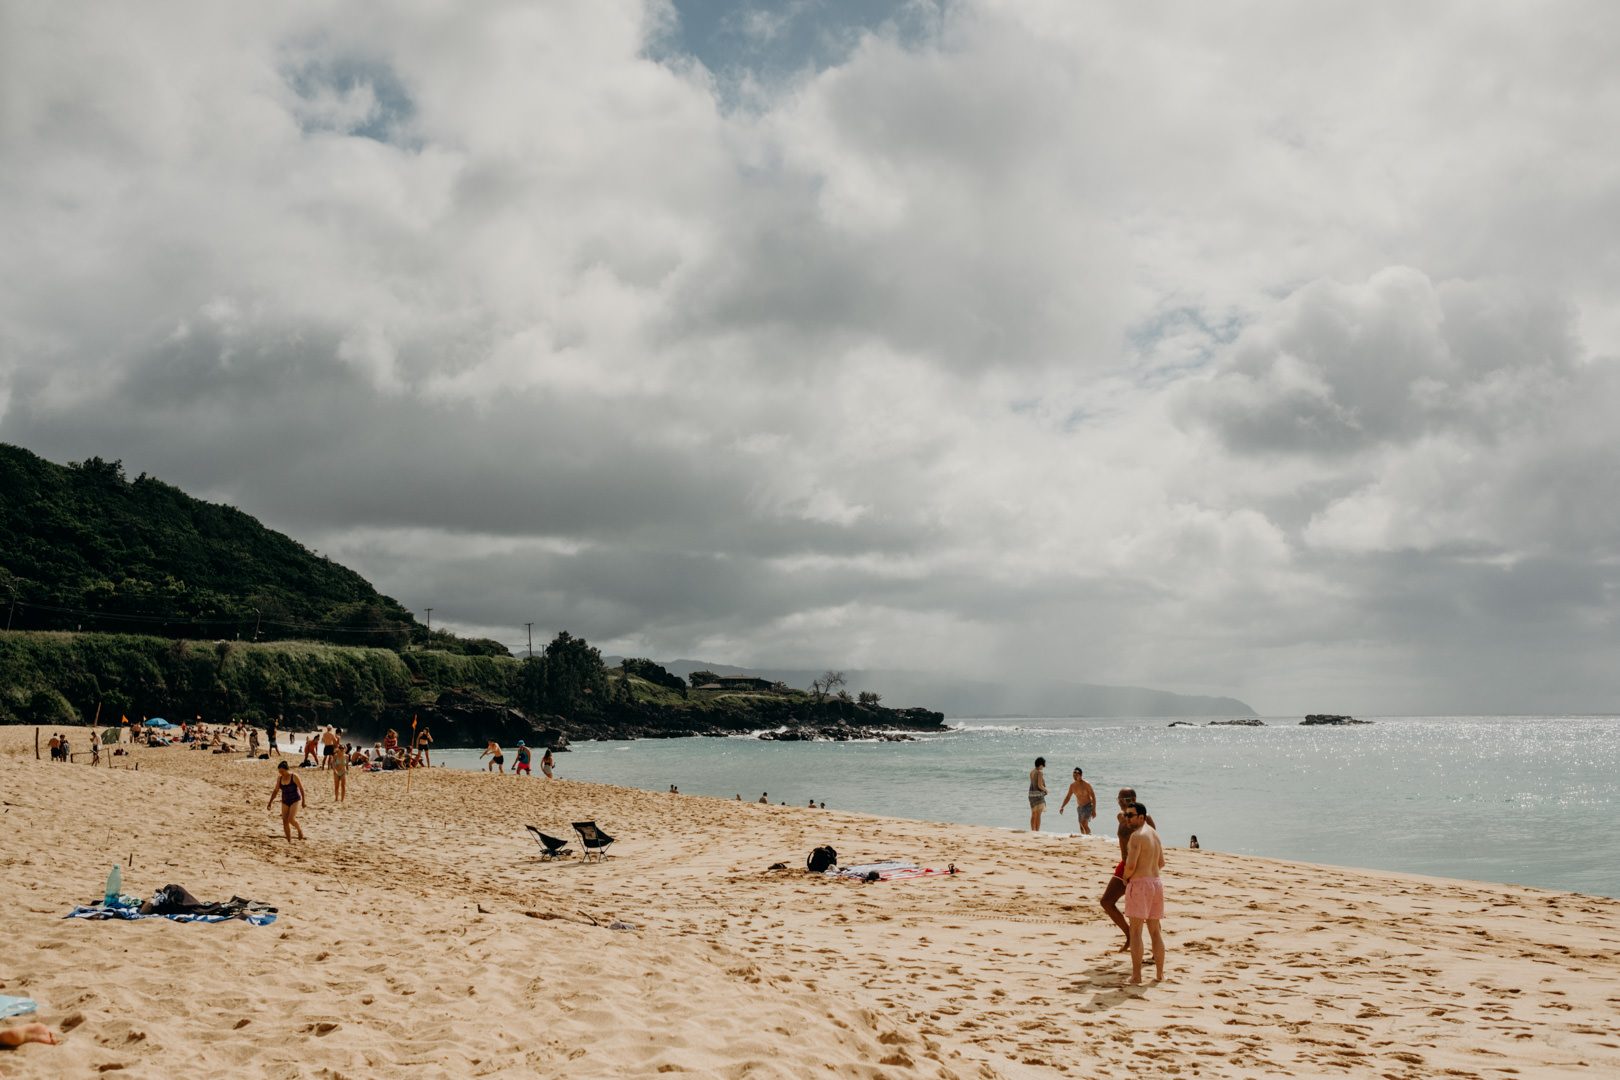 20180424_Visit Hawaii_North Shore_Waimea Bay_6.jpg